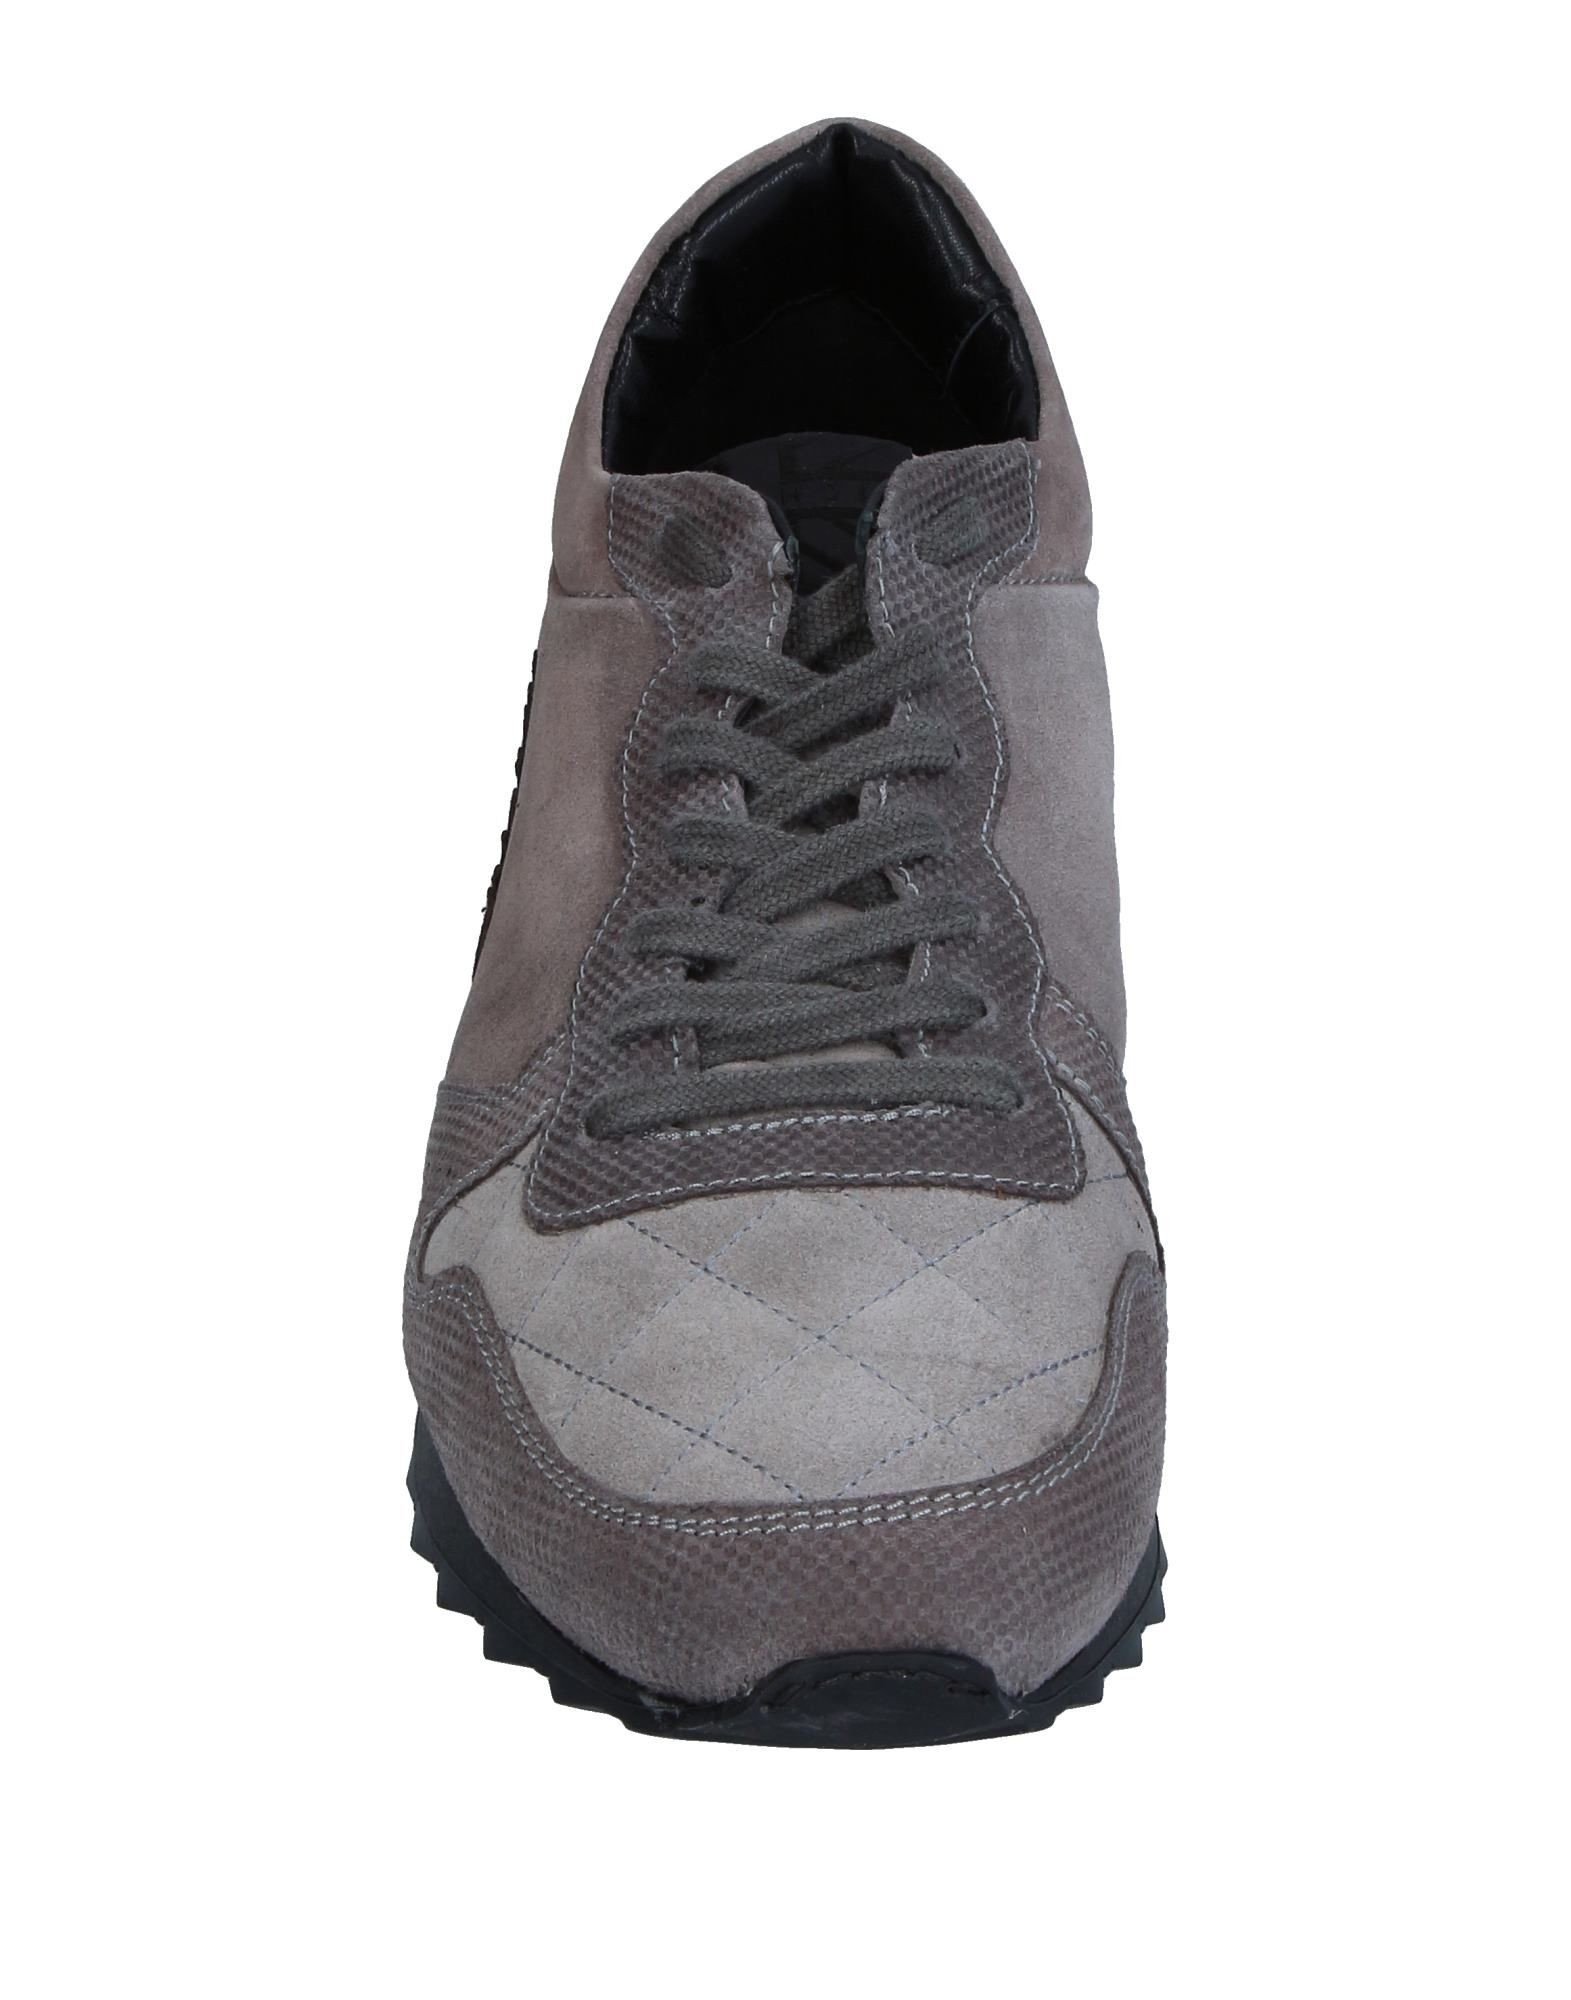 Richmond Sneakers - Men Men Men Richmond Sneakers online on  United Kingdom - 11345297KL 9e1366